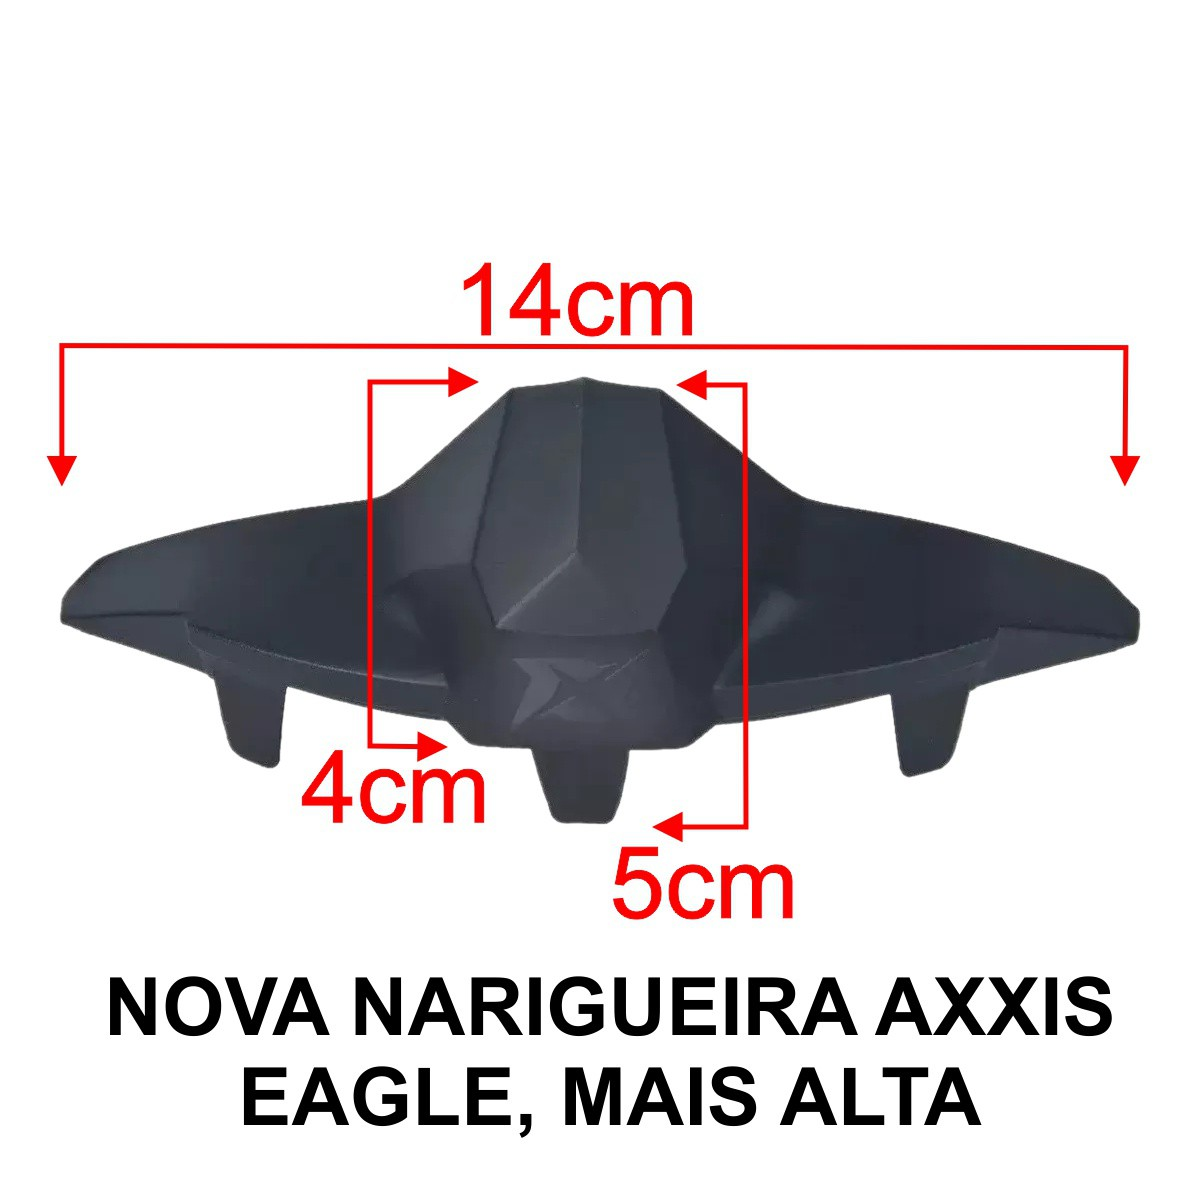 KIT VISEIRA AXXIS EAGLE BLACK FUMÊ V18 + NARIGUEIRA NEW ALTA